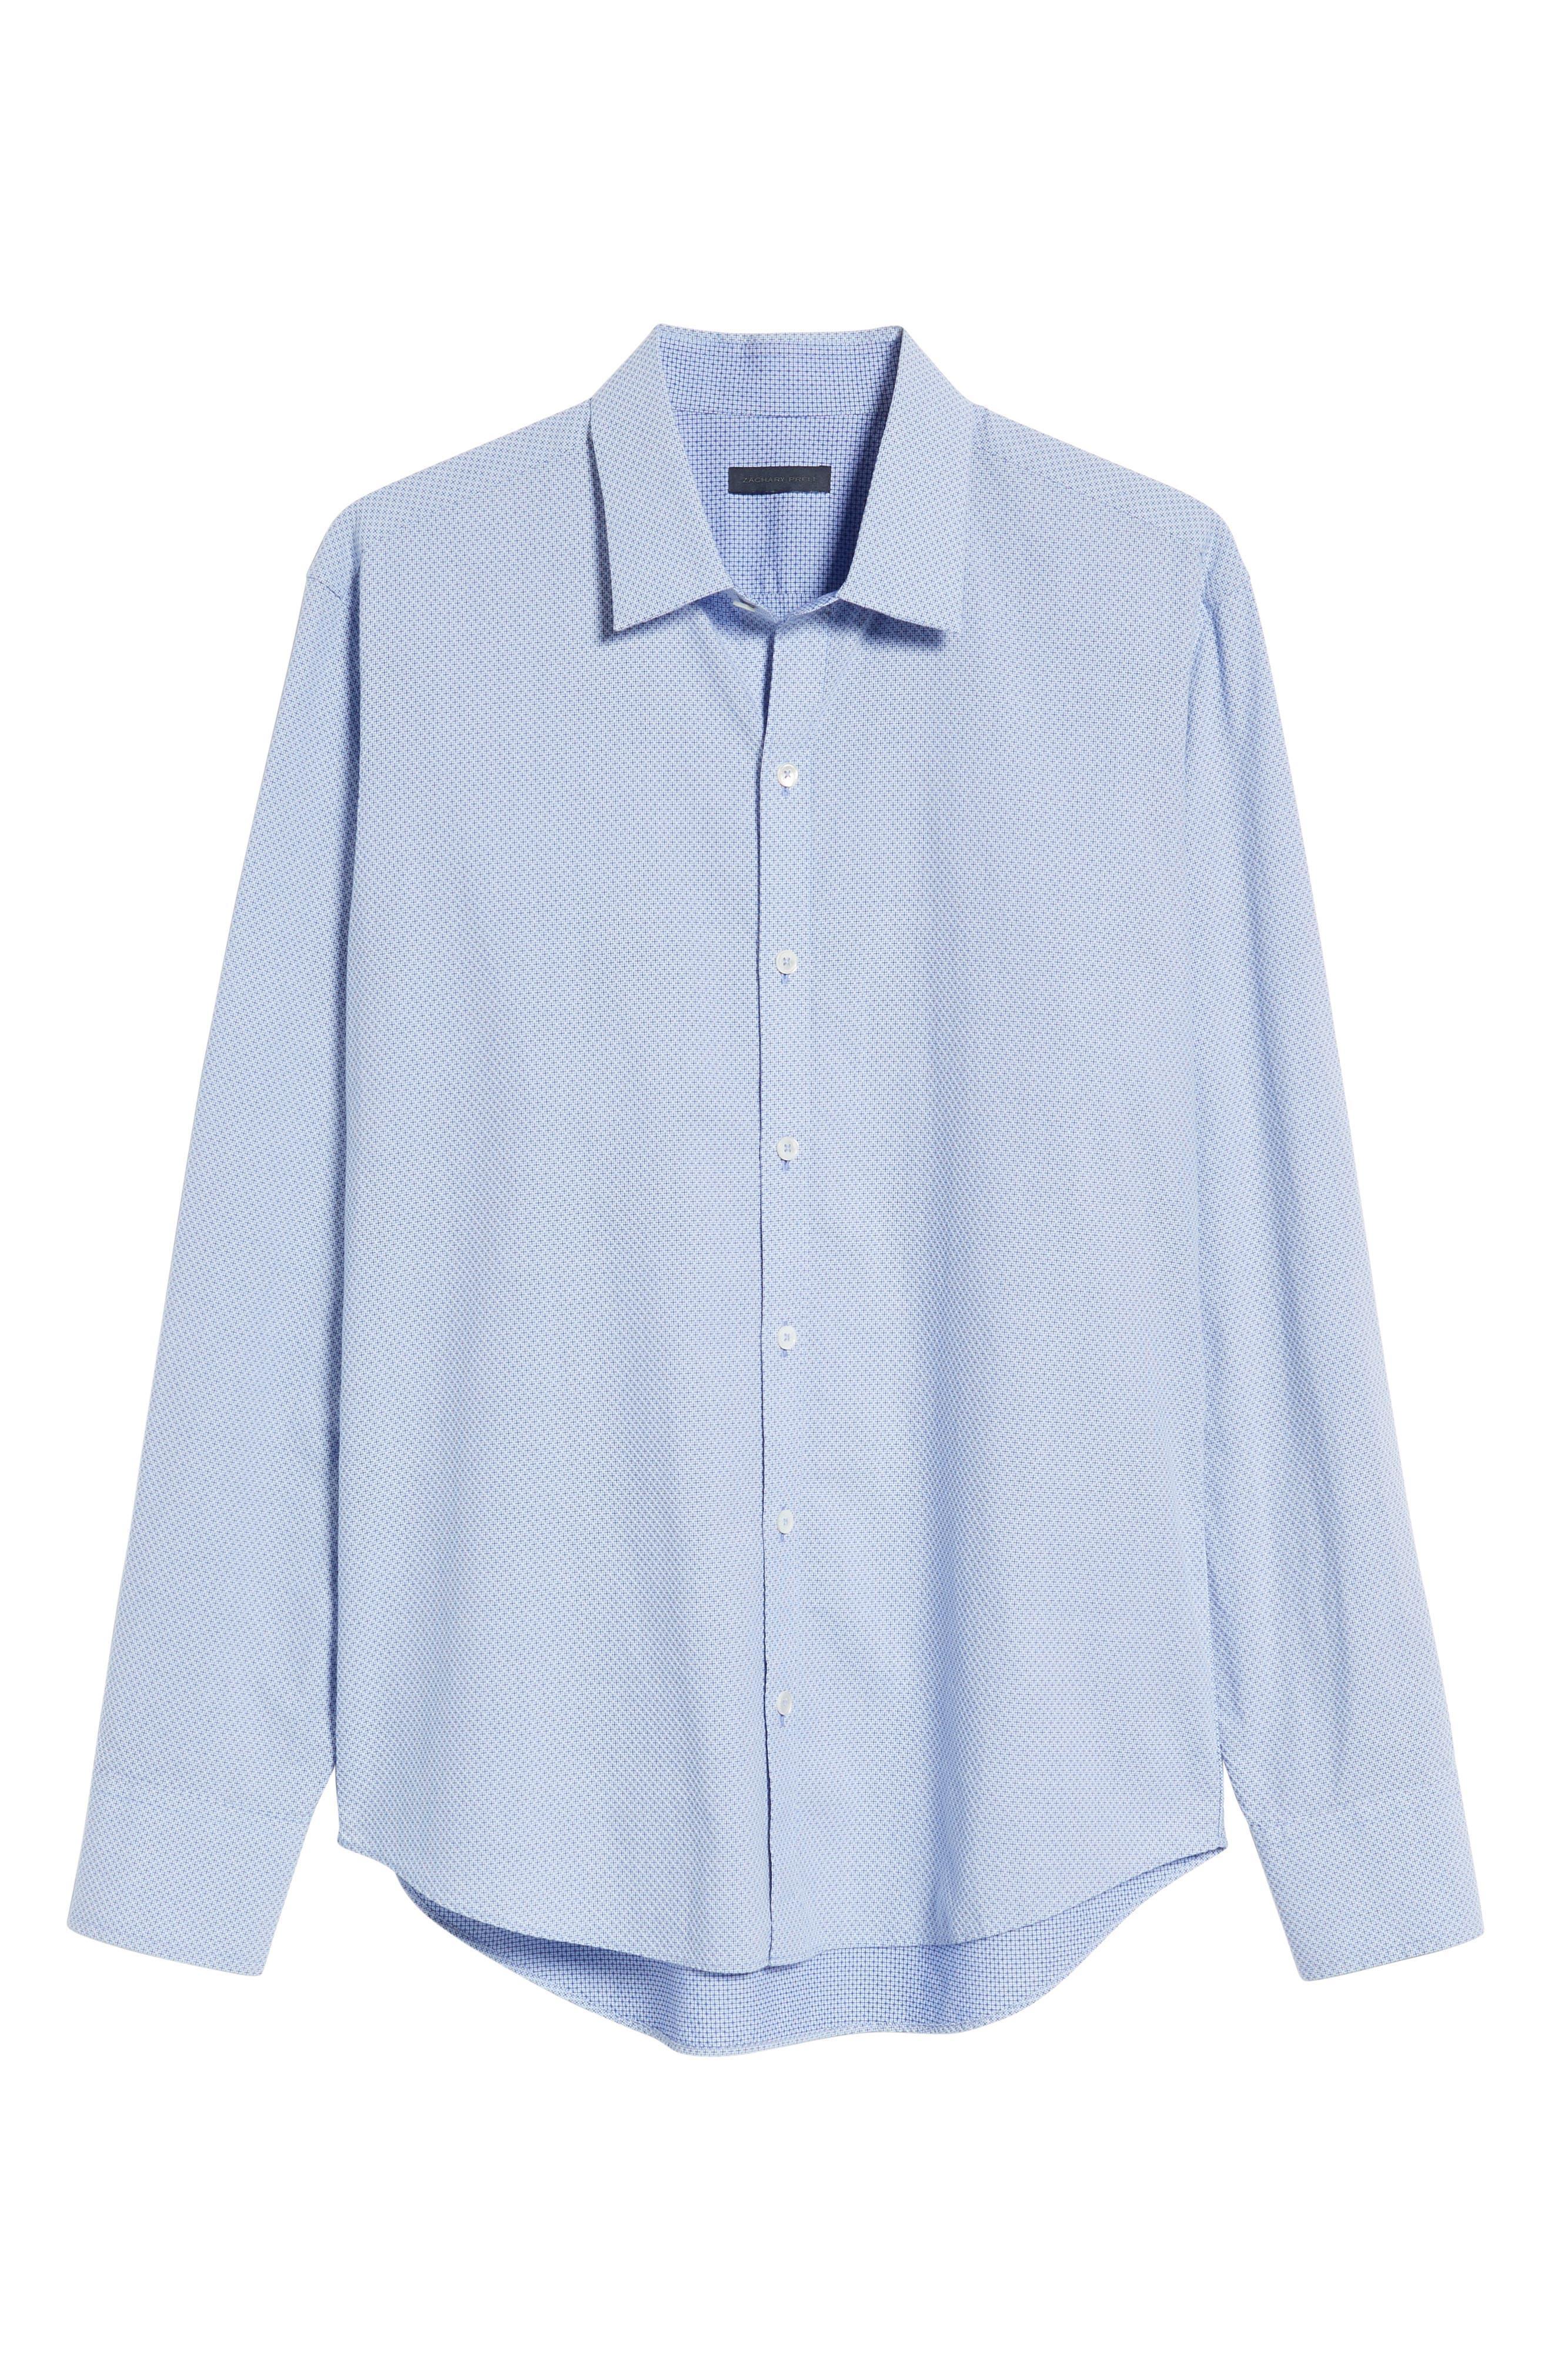 Jamba Regular Fit Sport Shirt,                             Alternate thumbnail 6, color,                             400